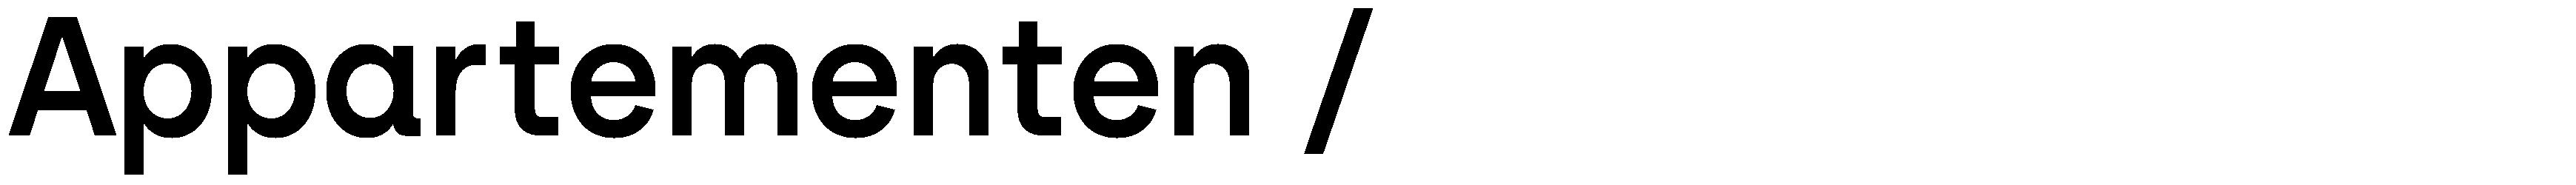 084f6c80-1acc-11eb-b512-bf138ccee77b.png